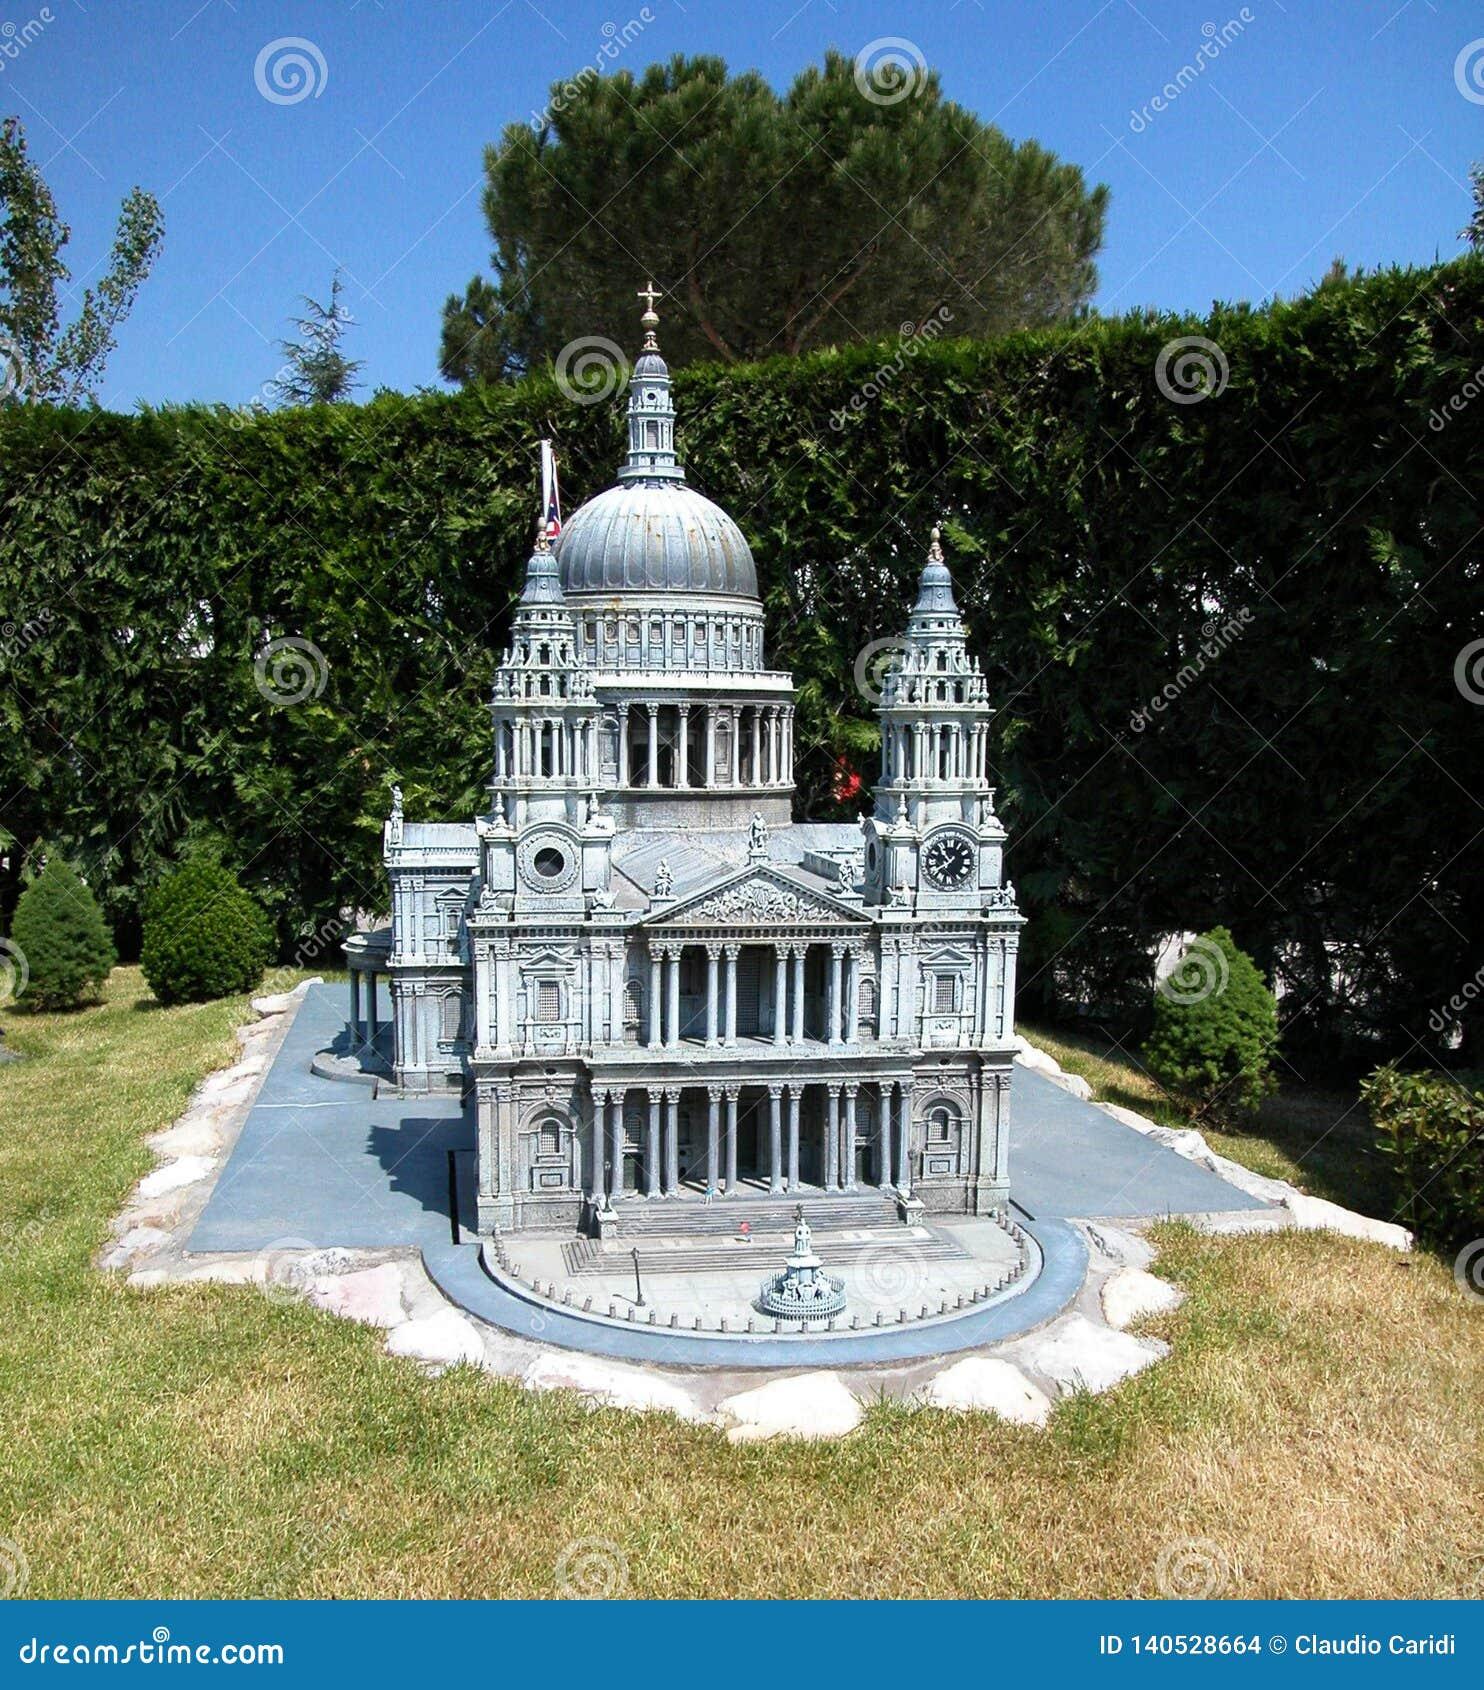 Cathedral of Saint Paul in the theme park `Italy in miniature` Italia in miniatura Viserba, Rimini, Italy